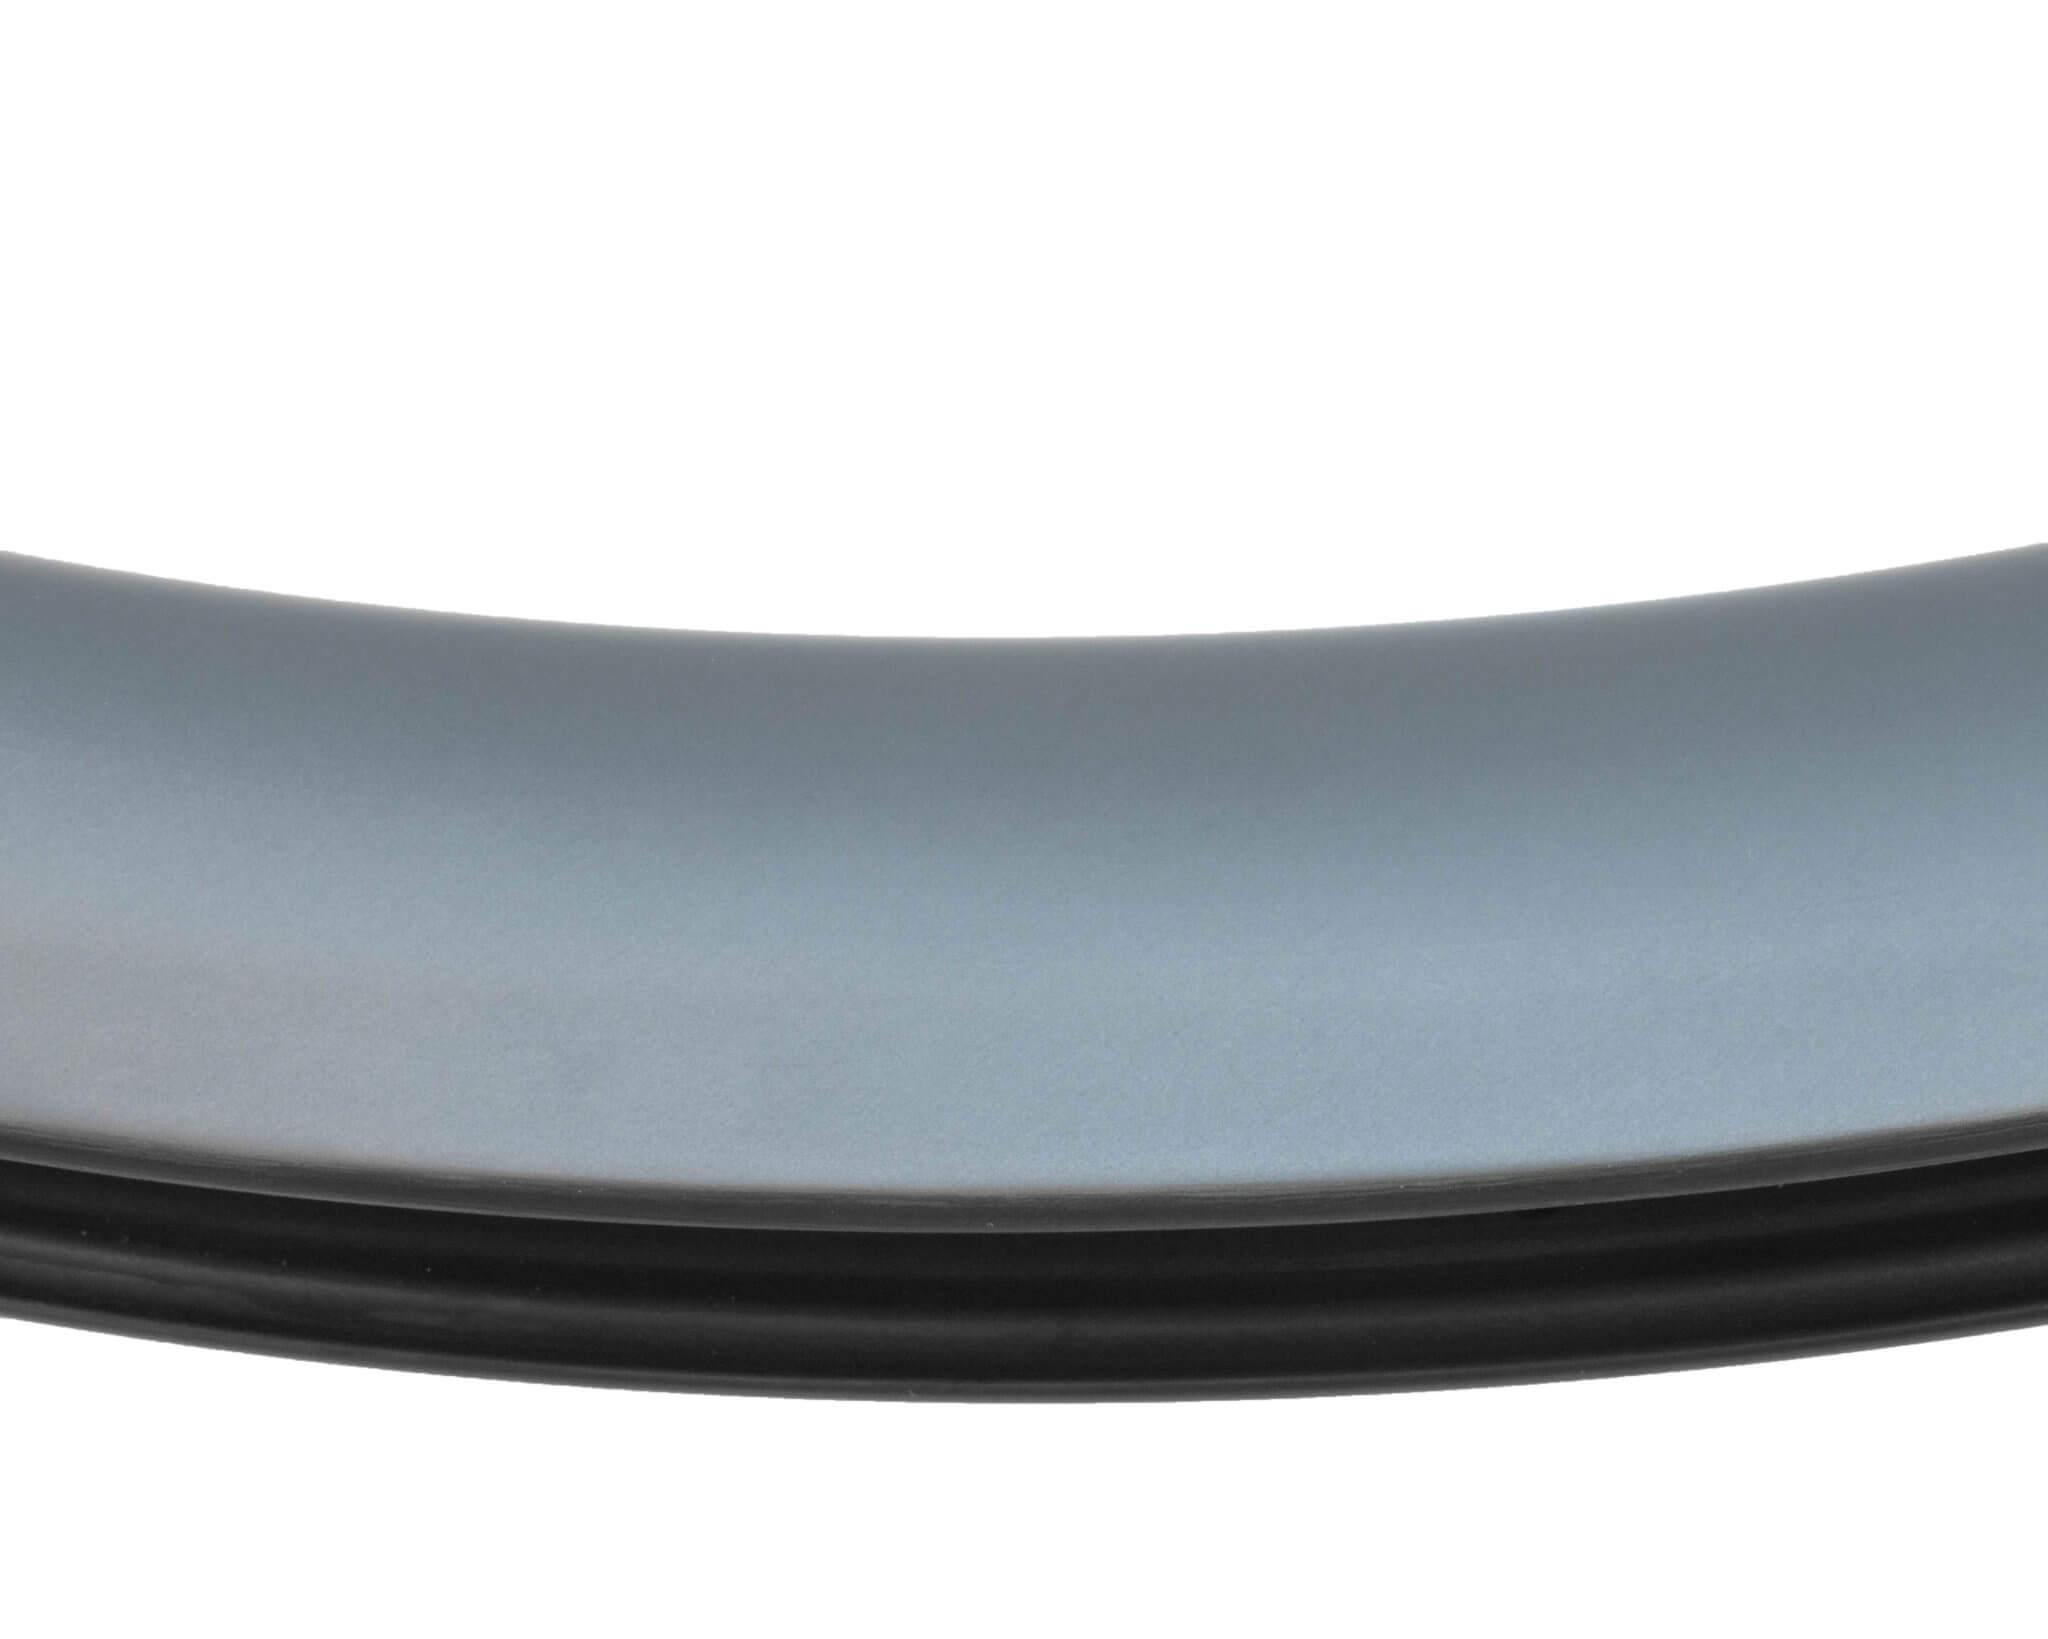 26x40mm TLR ディスクブレーキ リム